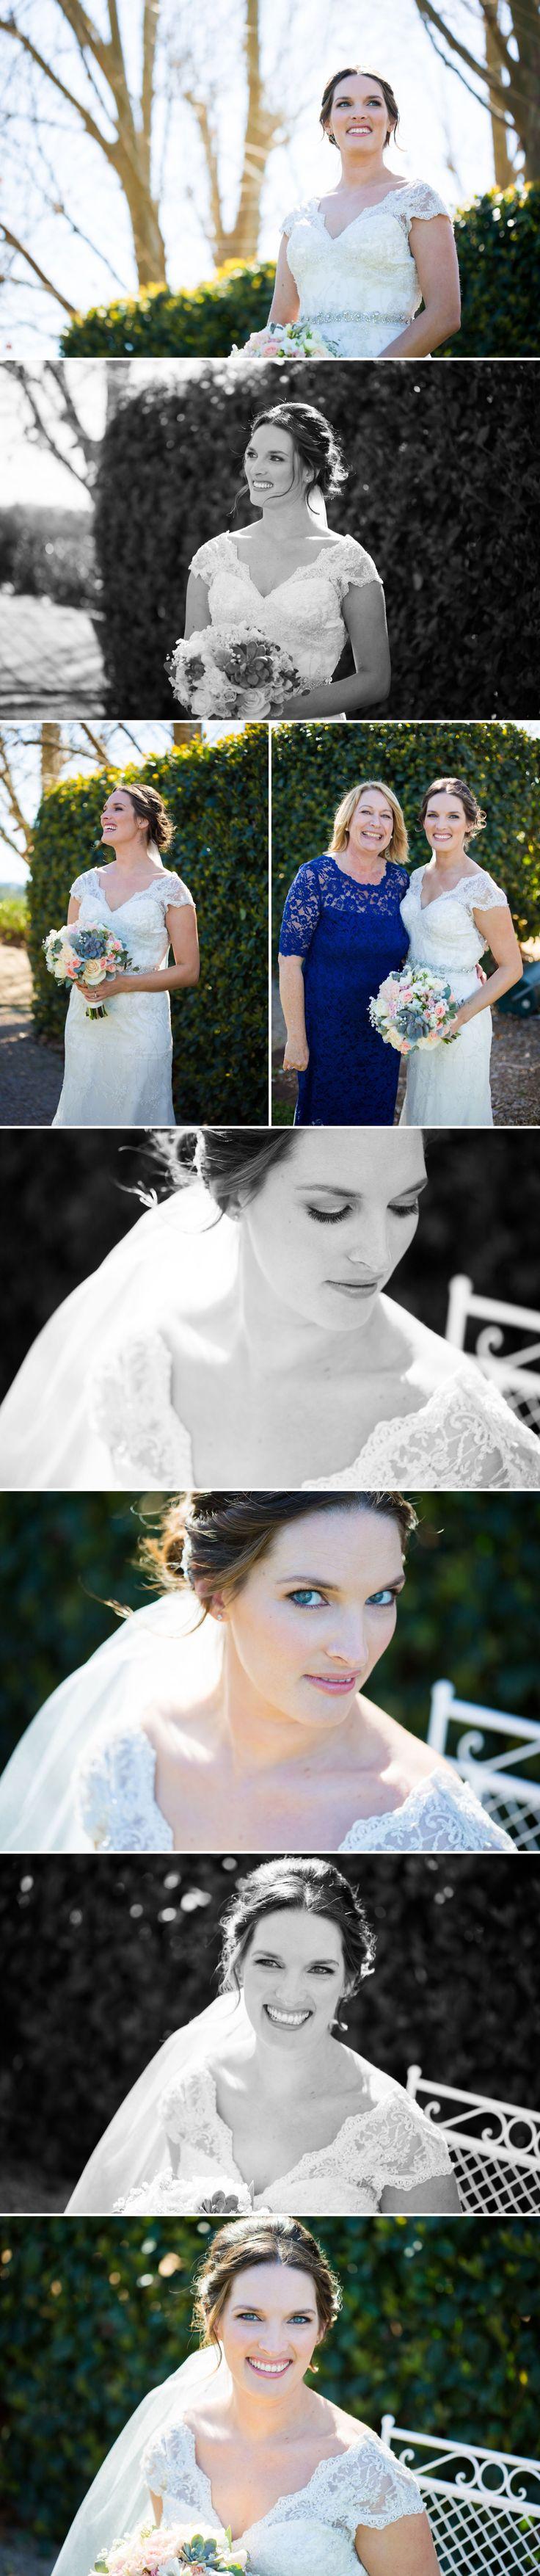 1-Noosa-Wedding-Photographer-SC-the-girls-6